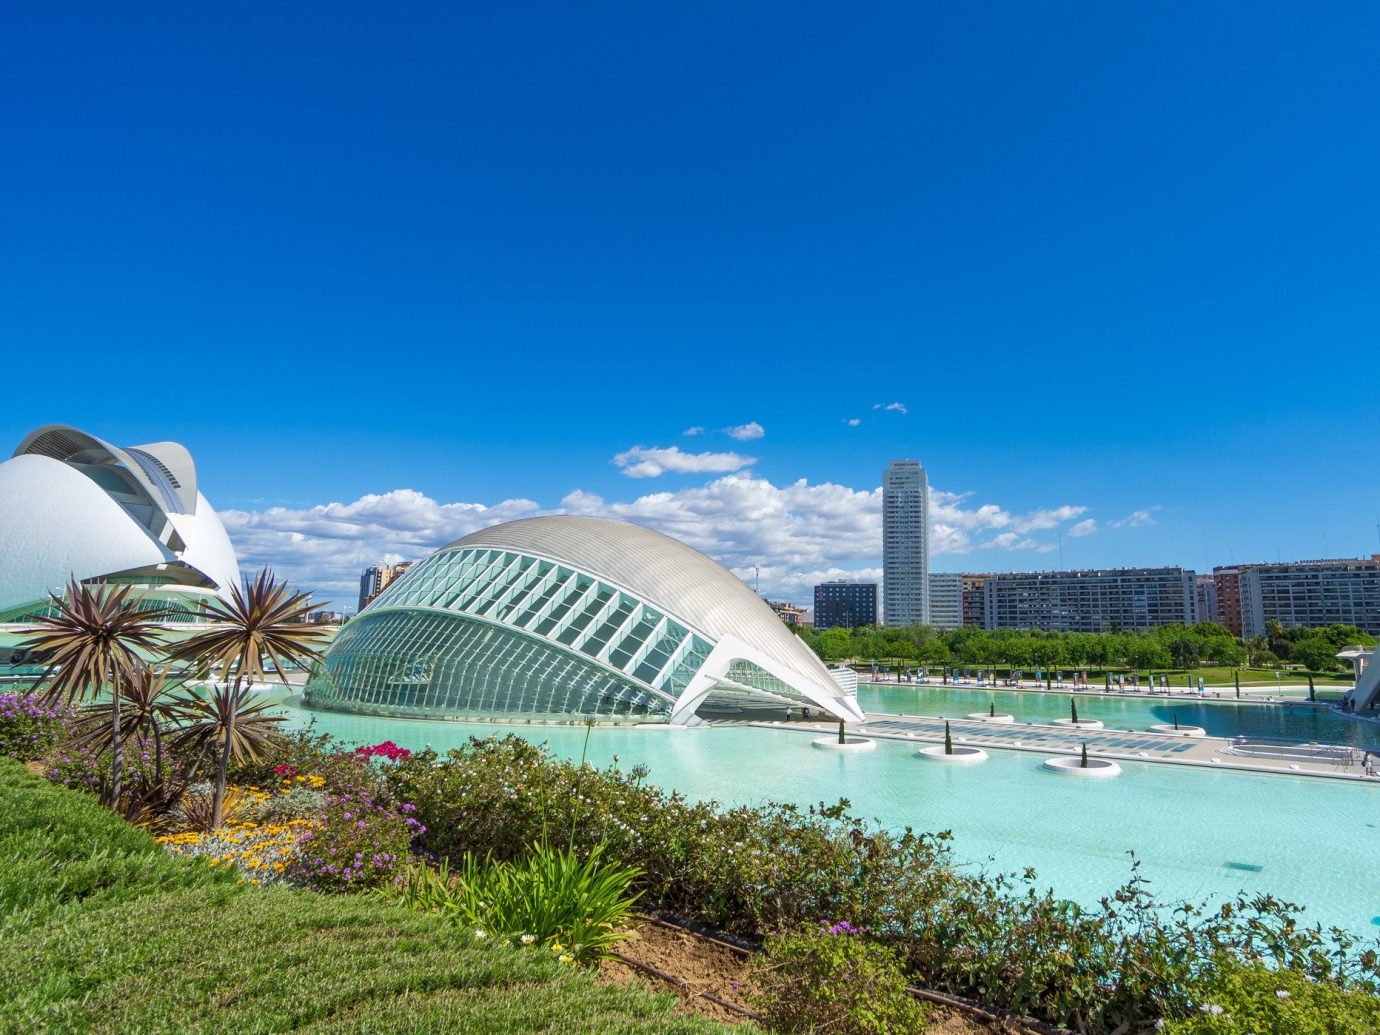 Trip Ideas outdoor sky grass structure landmark swimming pool building sport venue vacation Resort estate Sea stadium dome